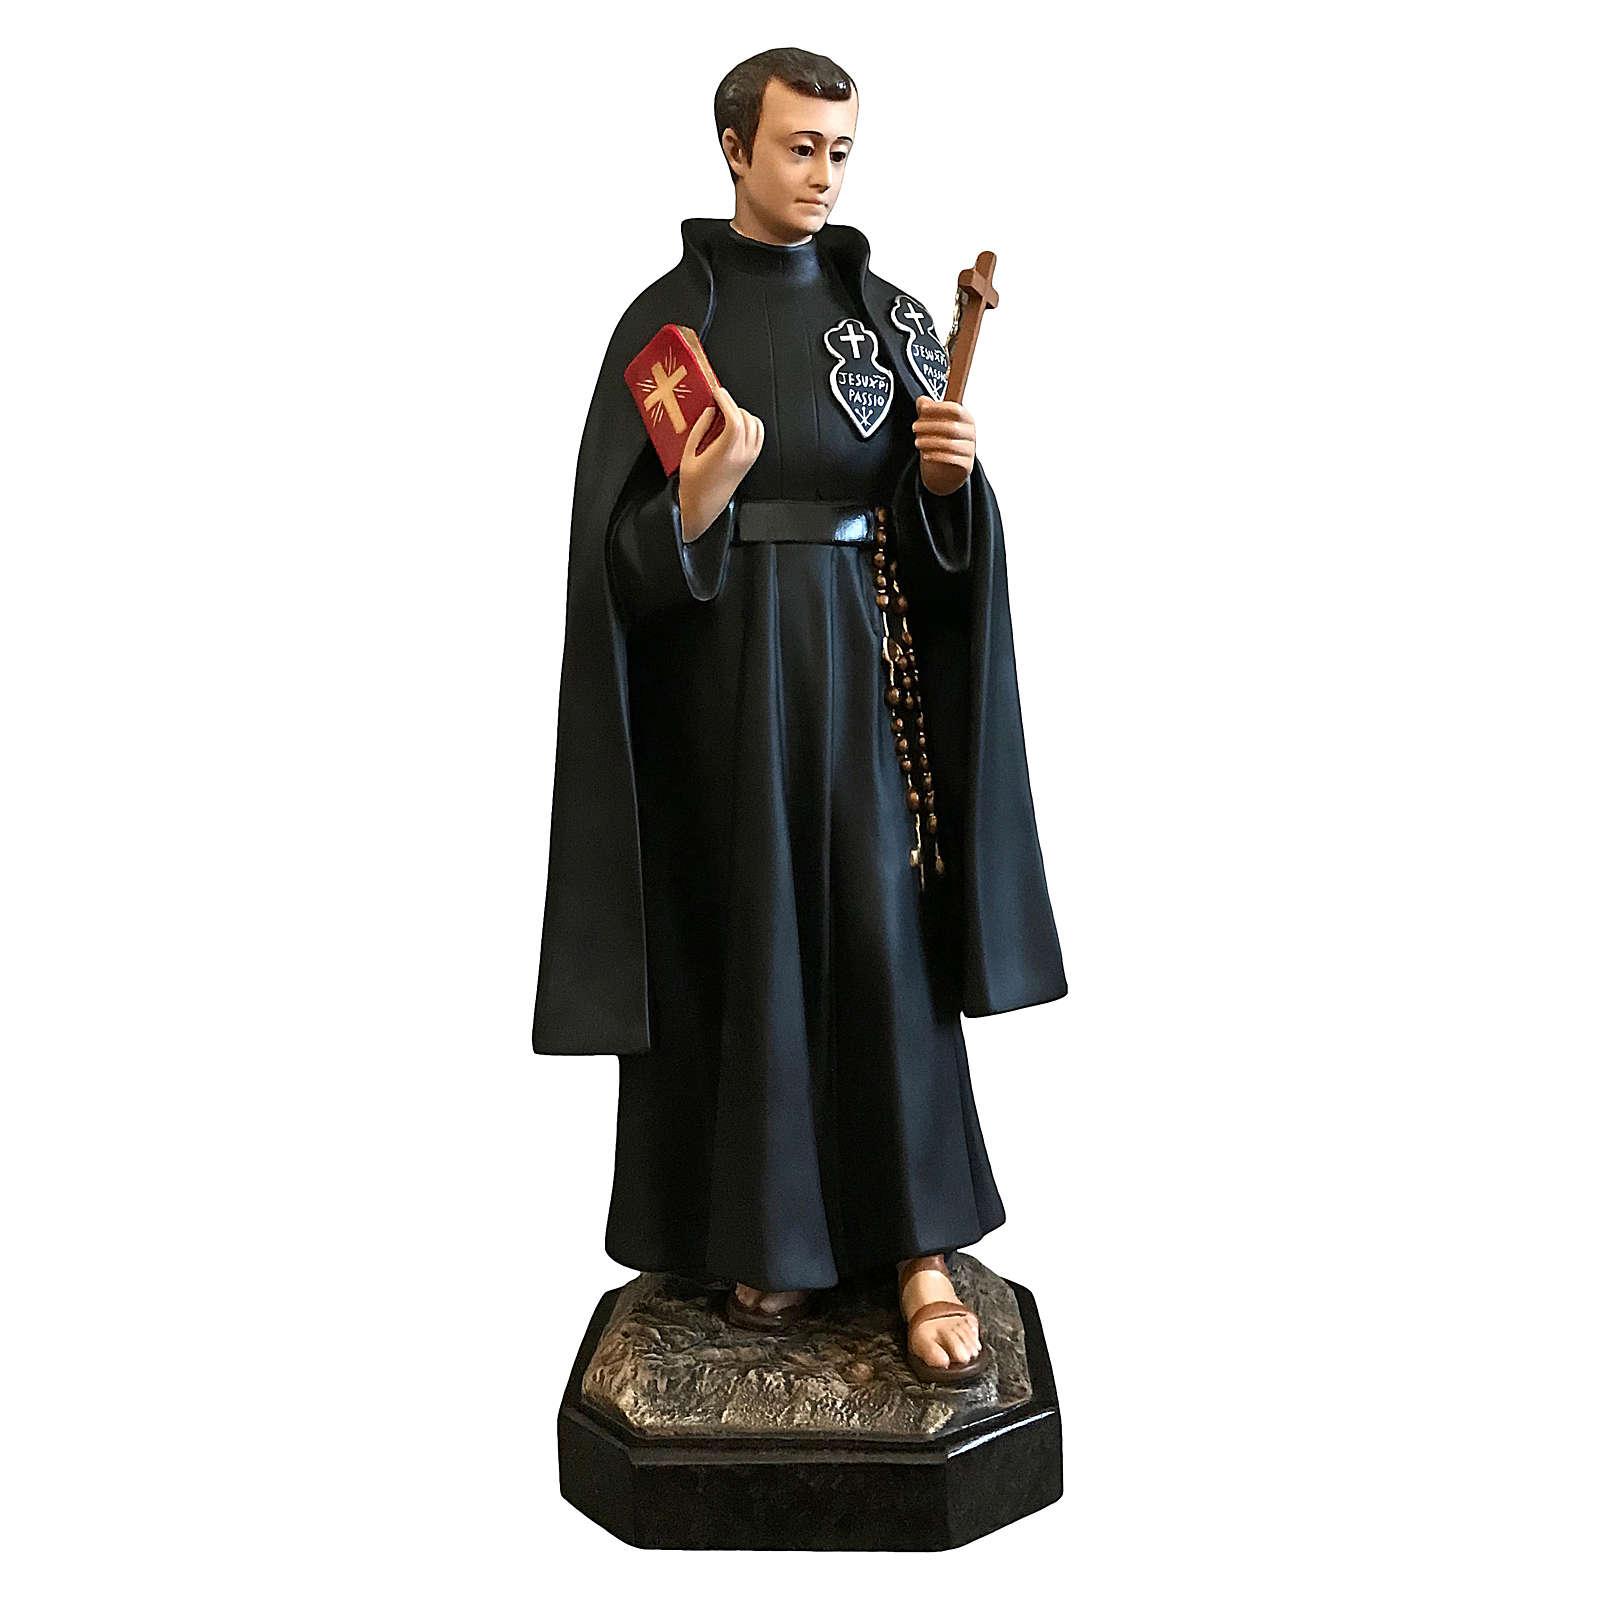 Statua San Gabriele 80 cm vetroresina colorata occhi vetro 4